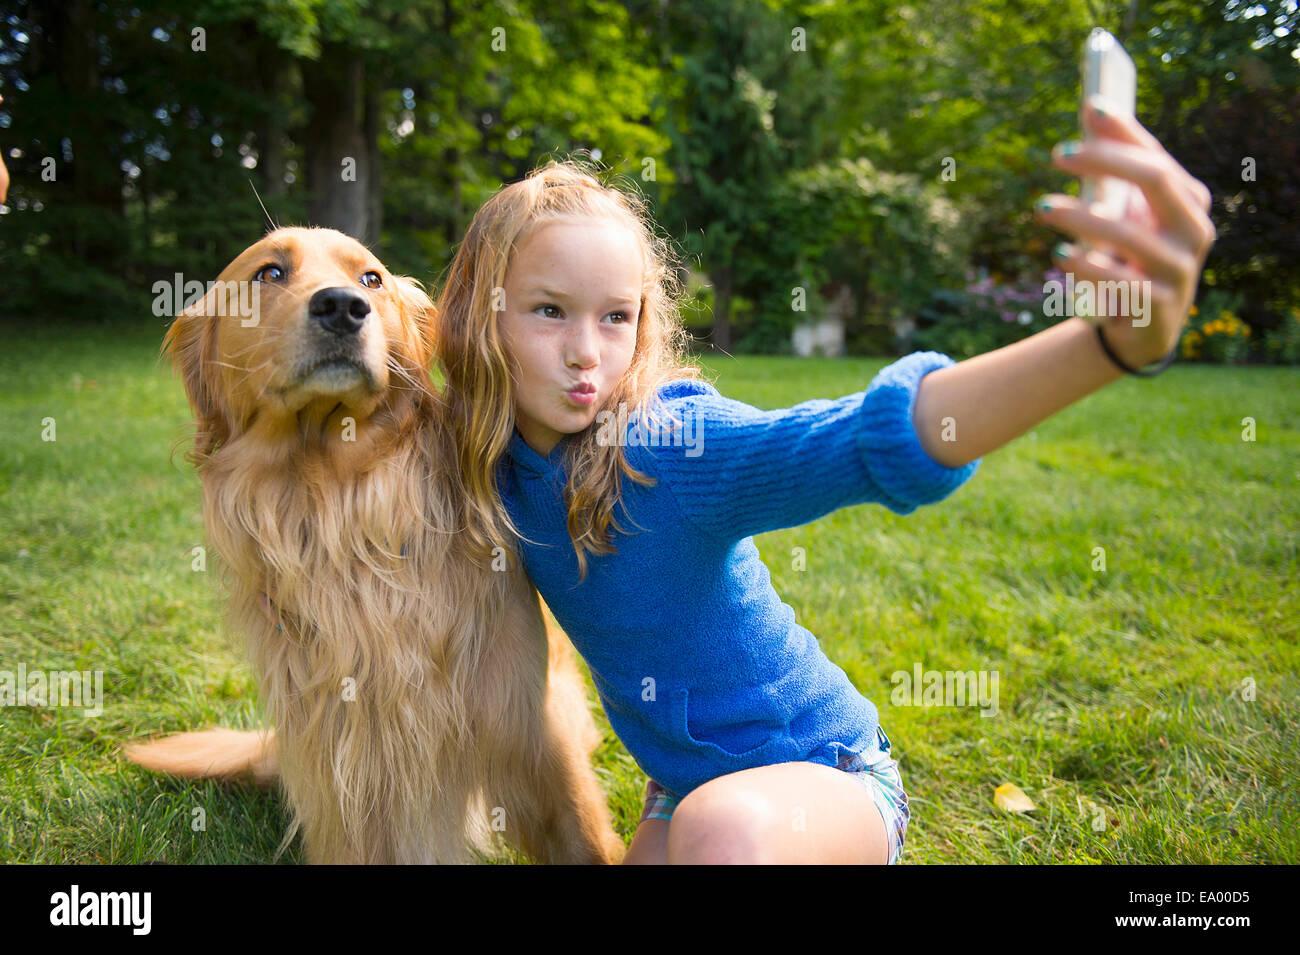 Girl taking selfie with pet dog in garden - Stock Image